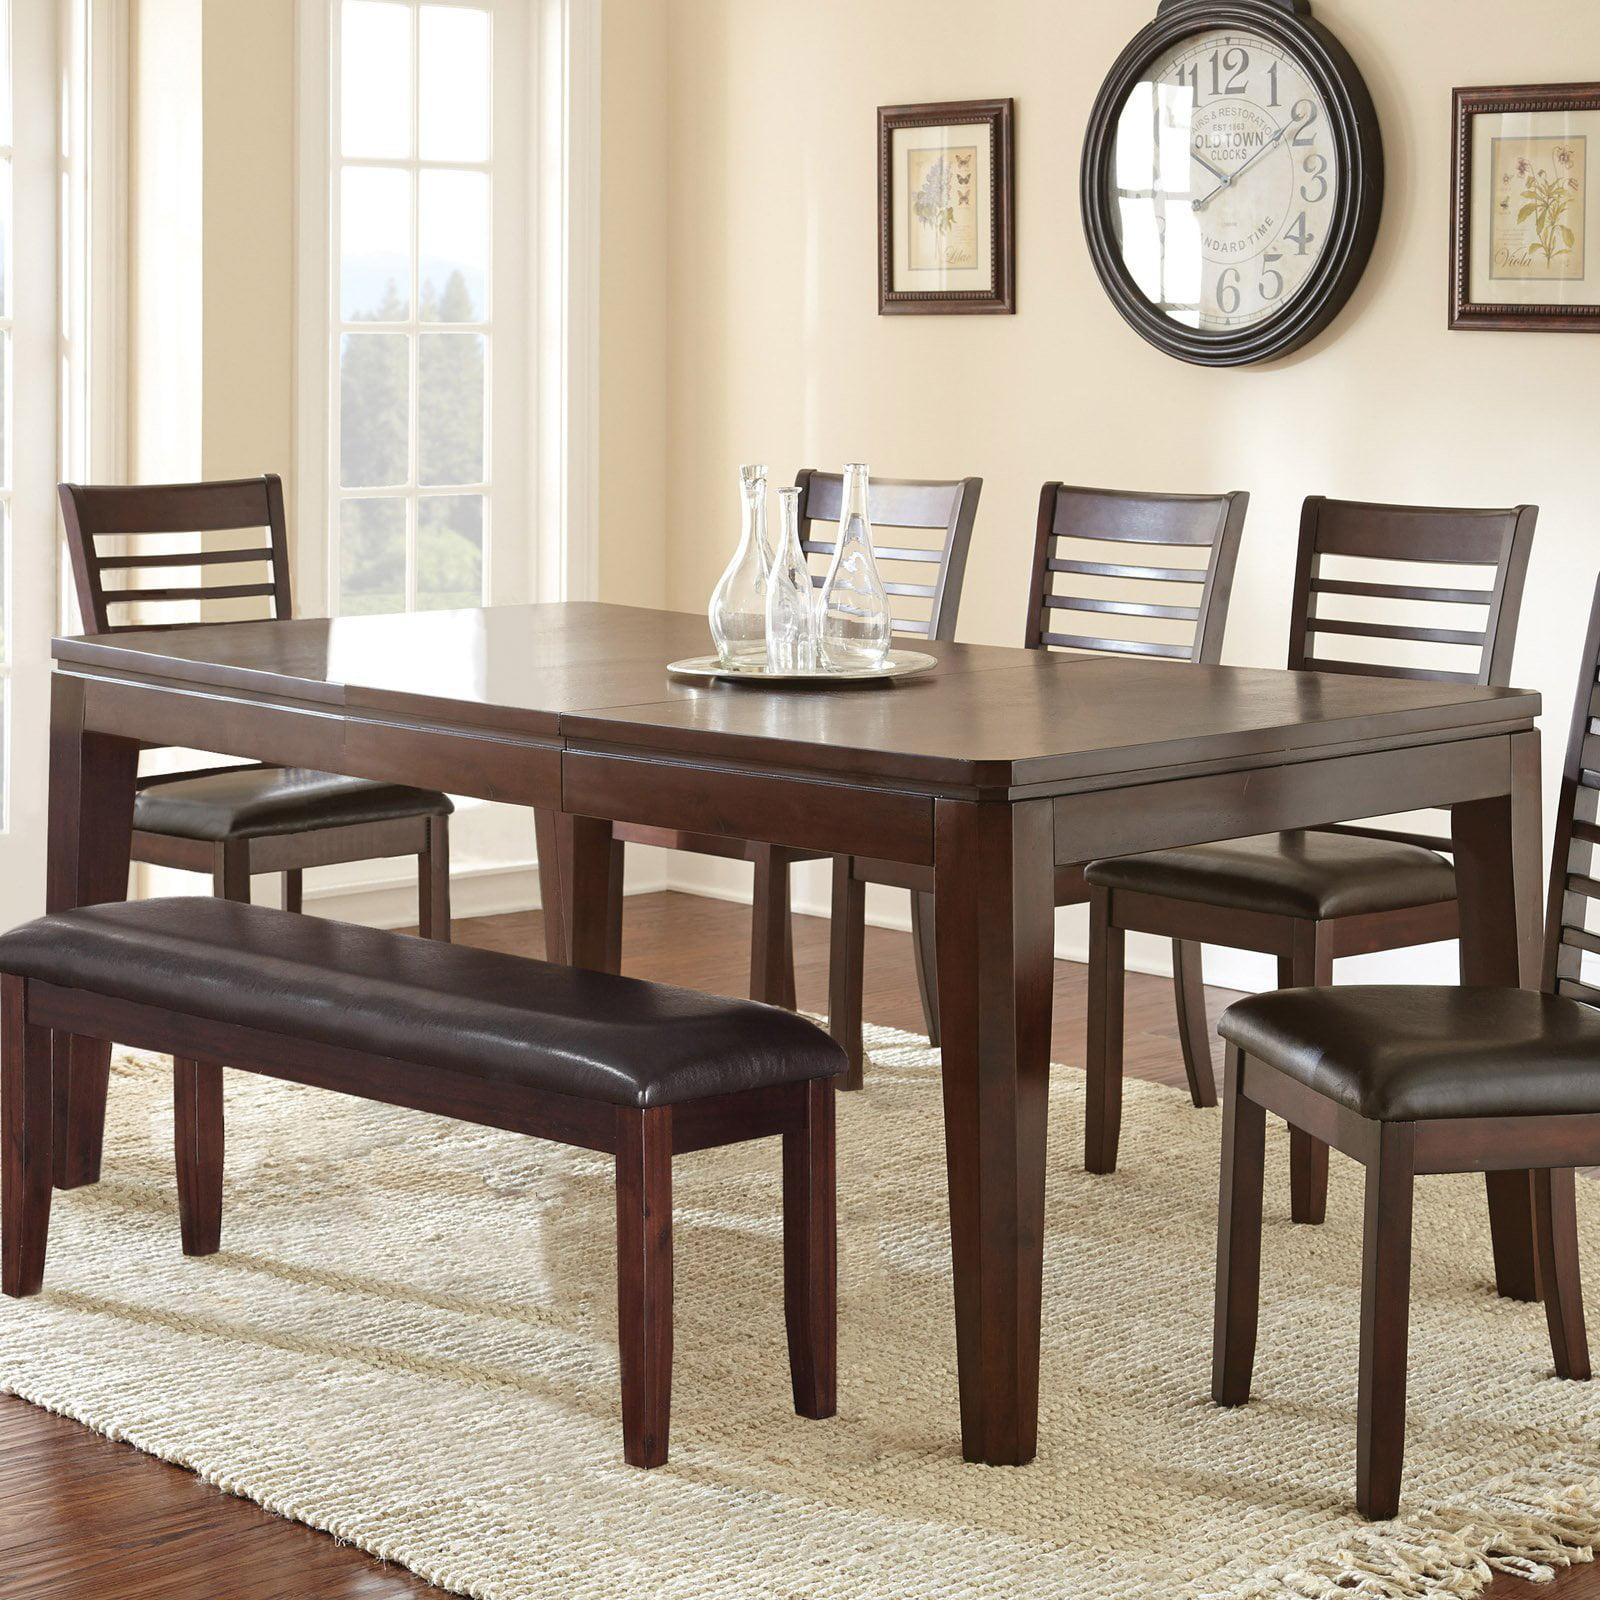 Steve Silver Allison Table by Steve Silver Company